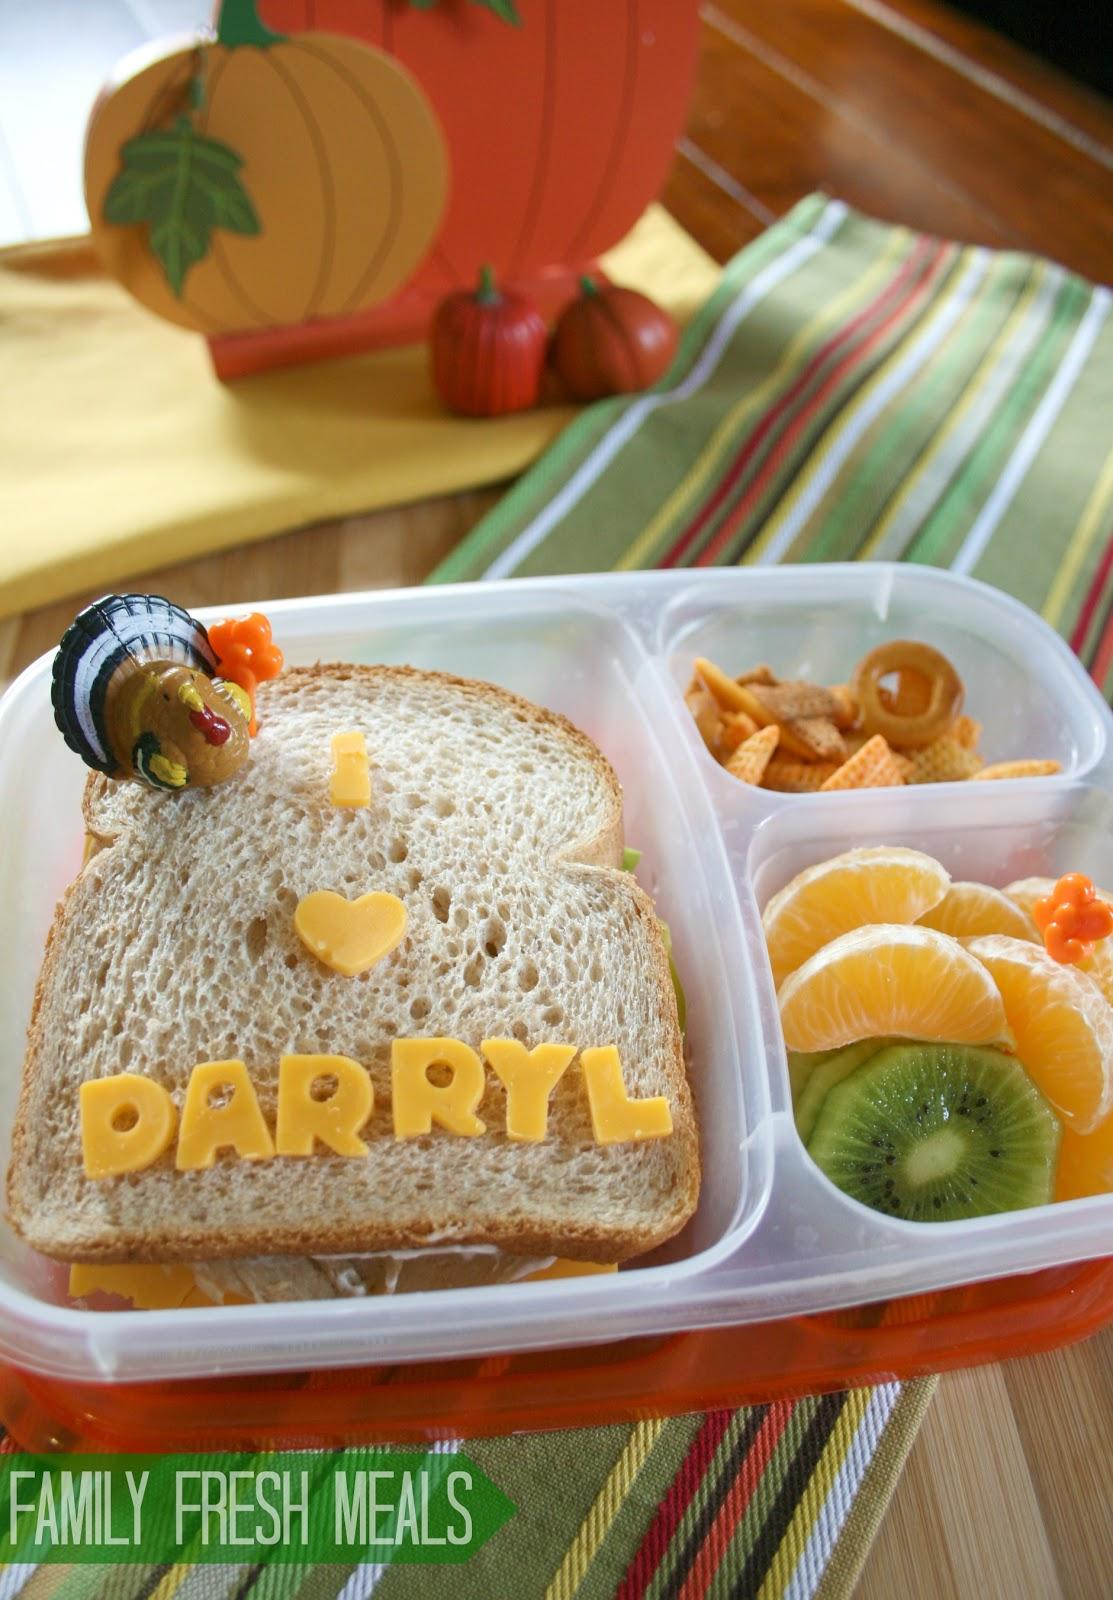 What Do Vegetarians Eat For Thanksgiving Family Fresh Meals